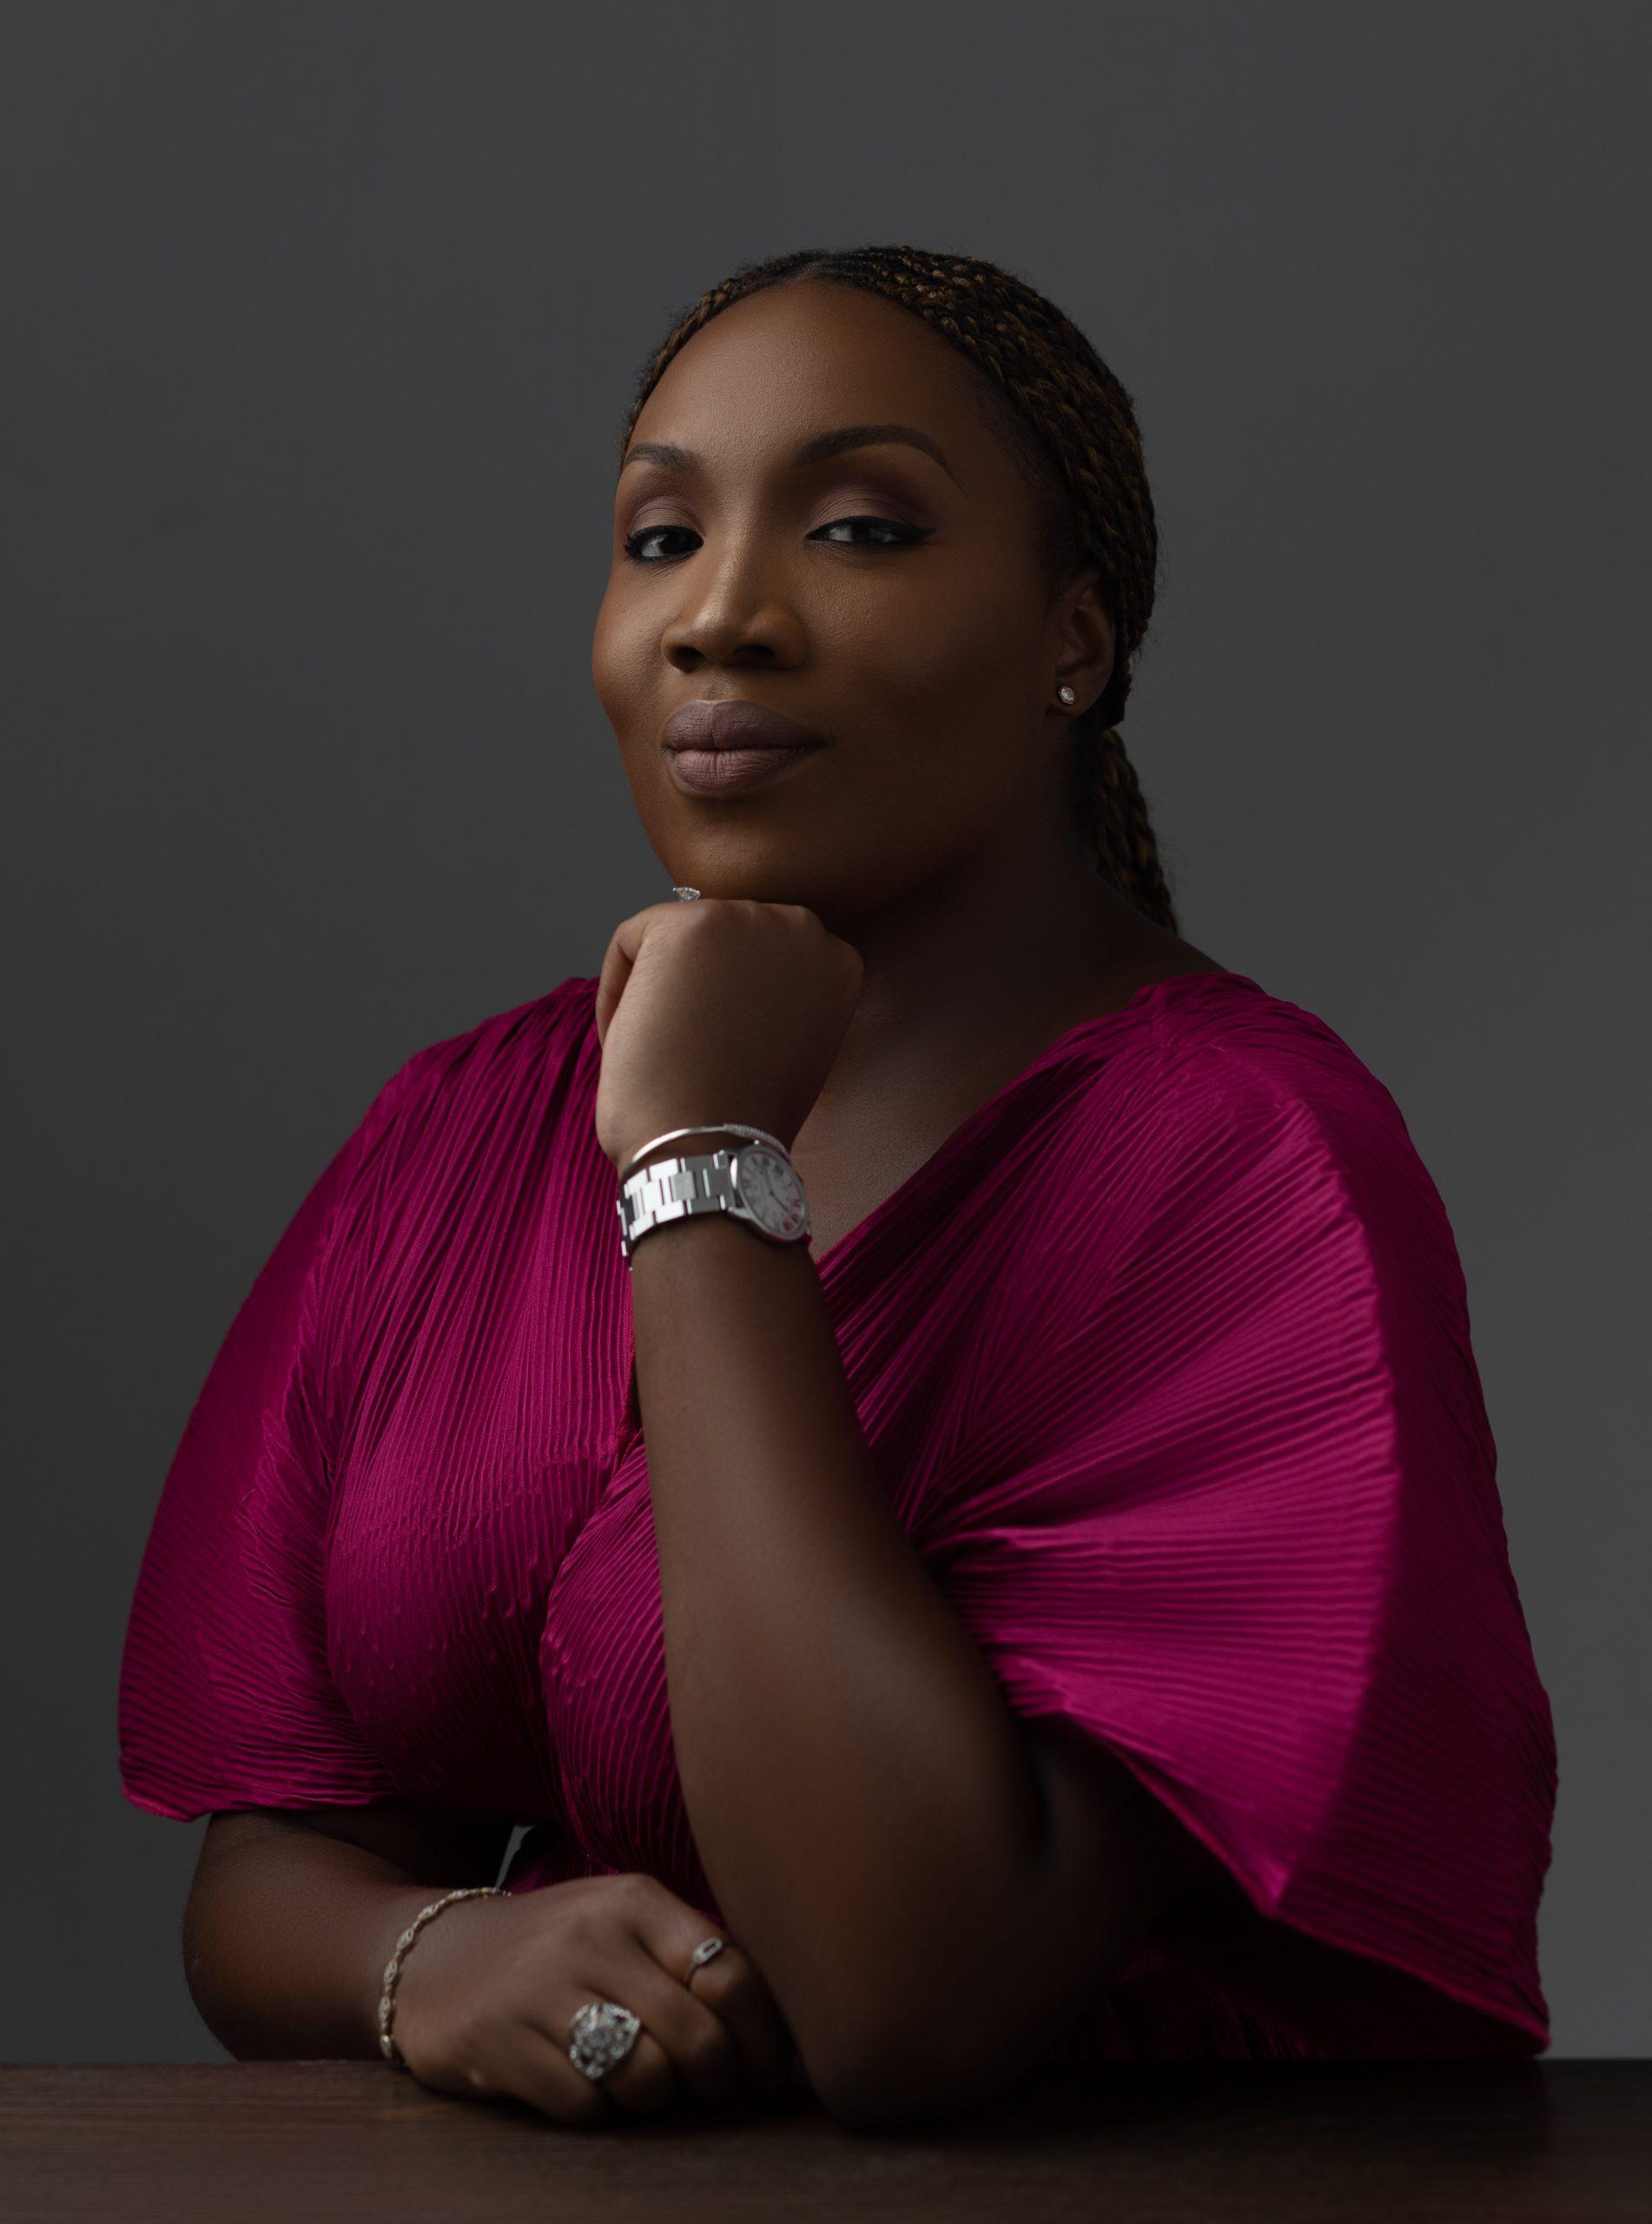 Nigeria's Uche Ogboi Appointed CEO of Africa E-Logistics Startup Lori Systems, SiliconNigeria